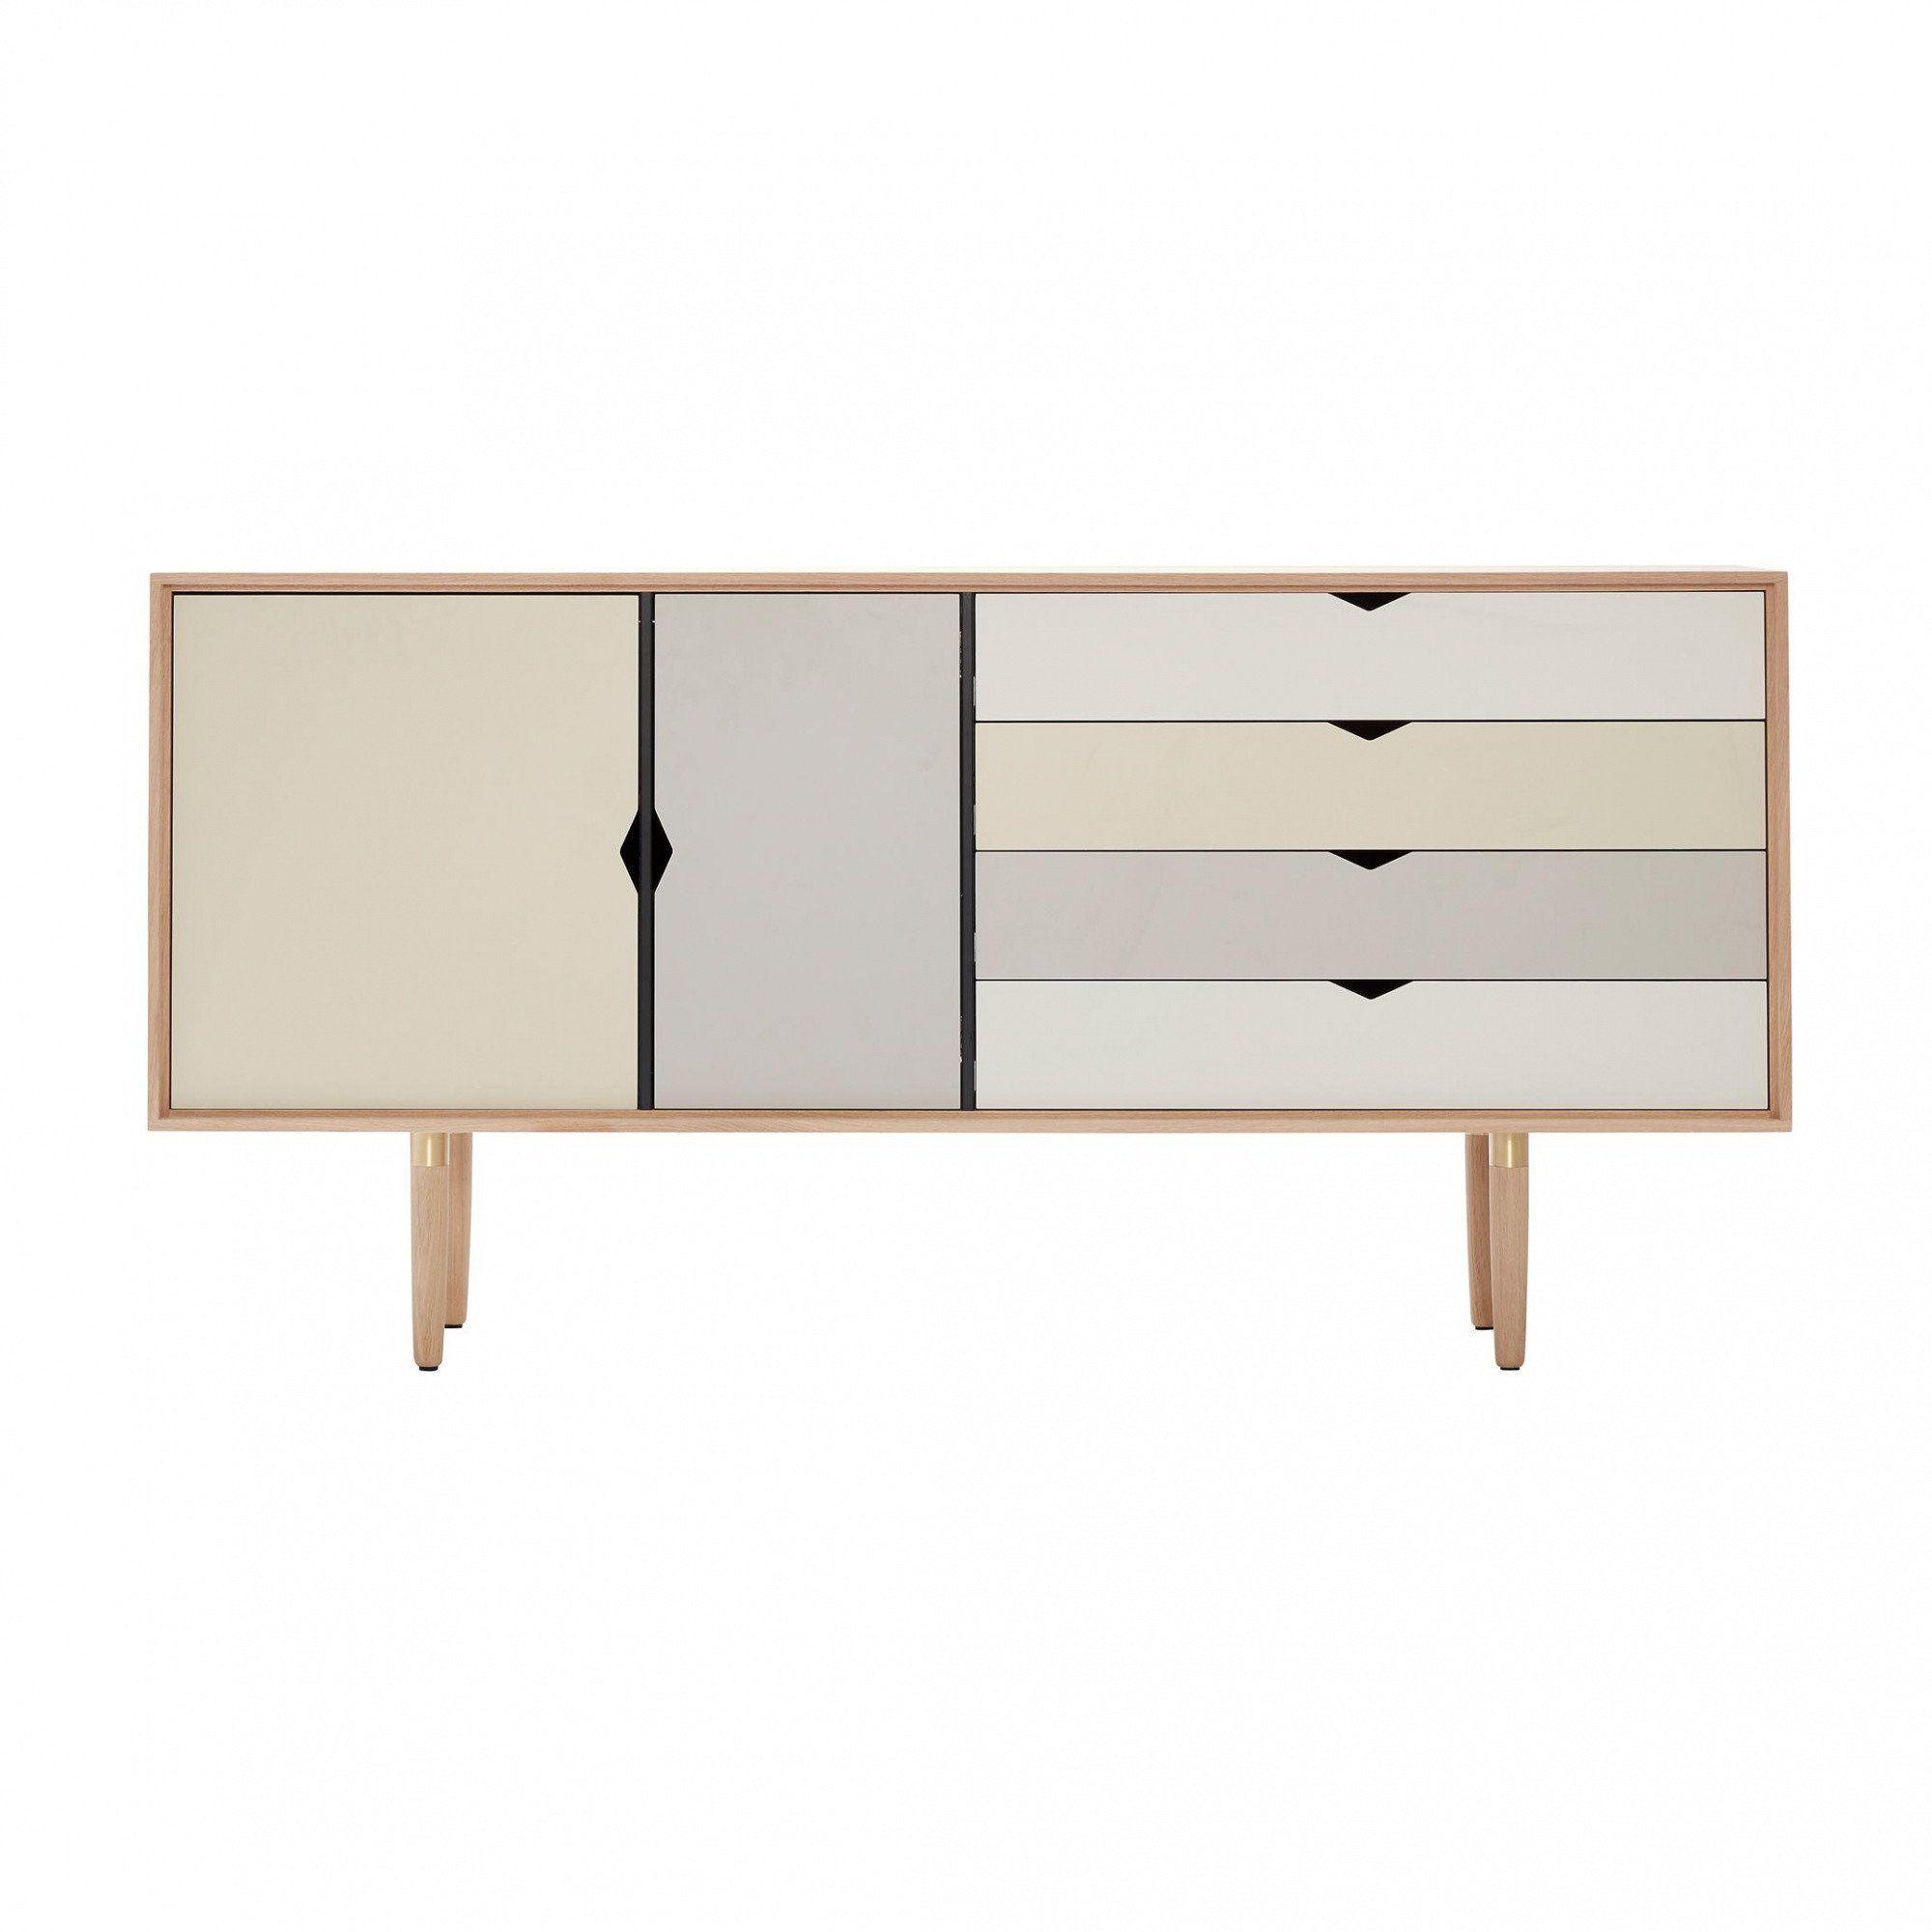 Bezaubernd Sideboard 180 Galerie Von Andersen Furniture - Andersen Furniture S6 Multicolored